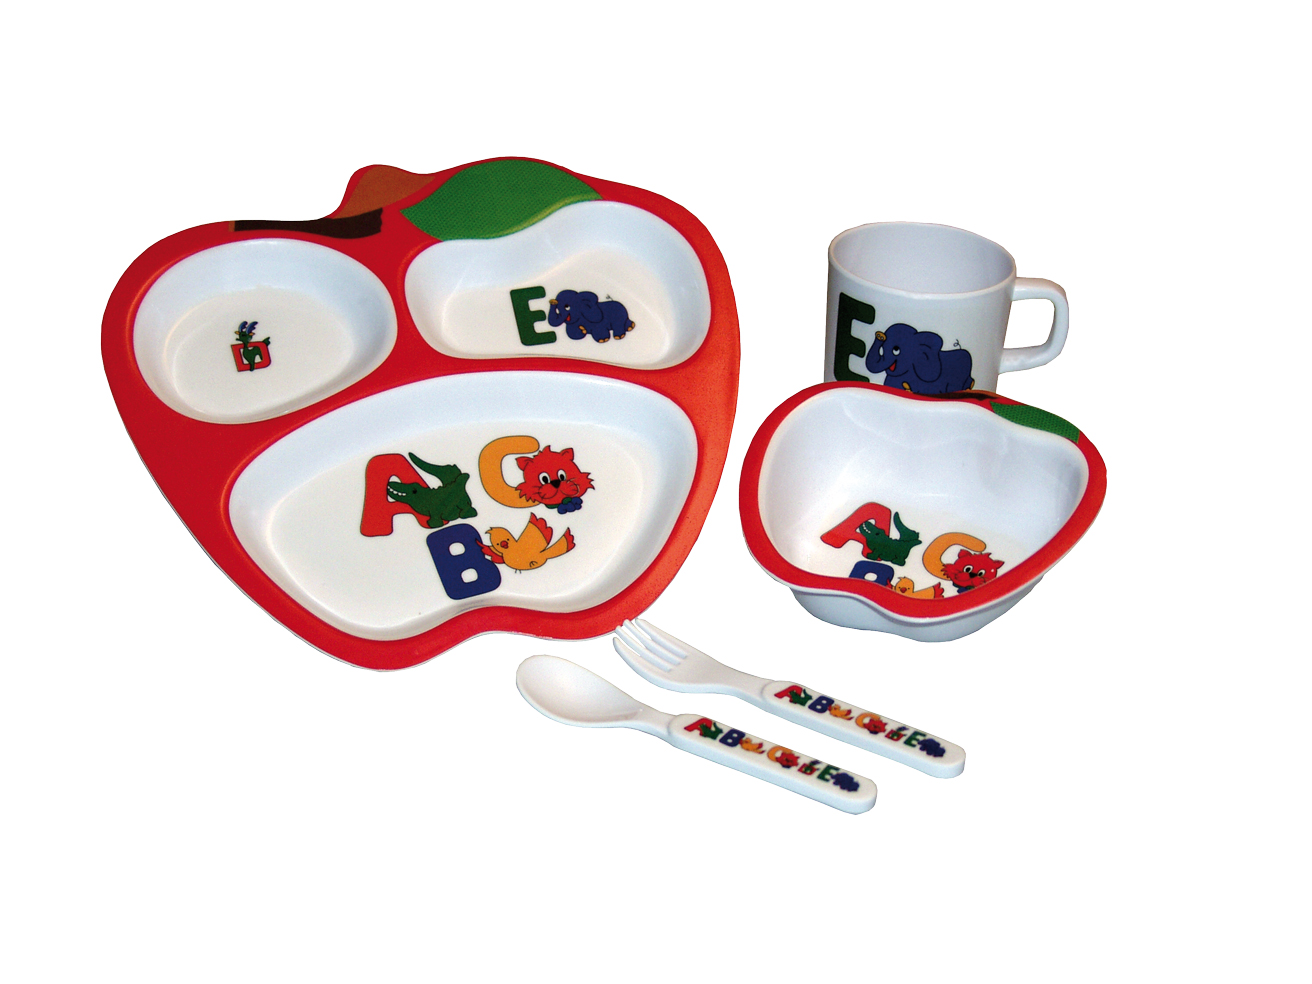 Gimex Kinder-Geschirr-Set 5 tlg.